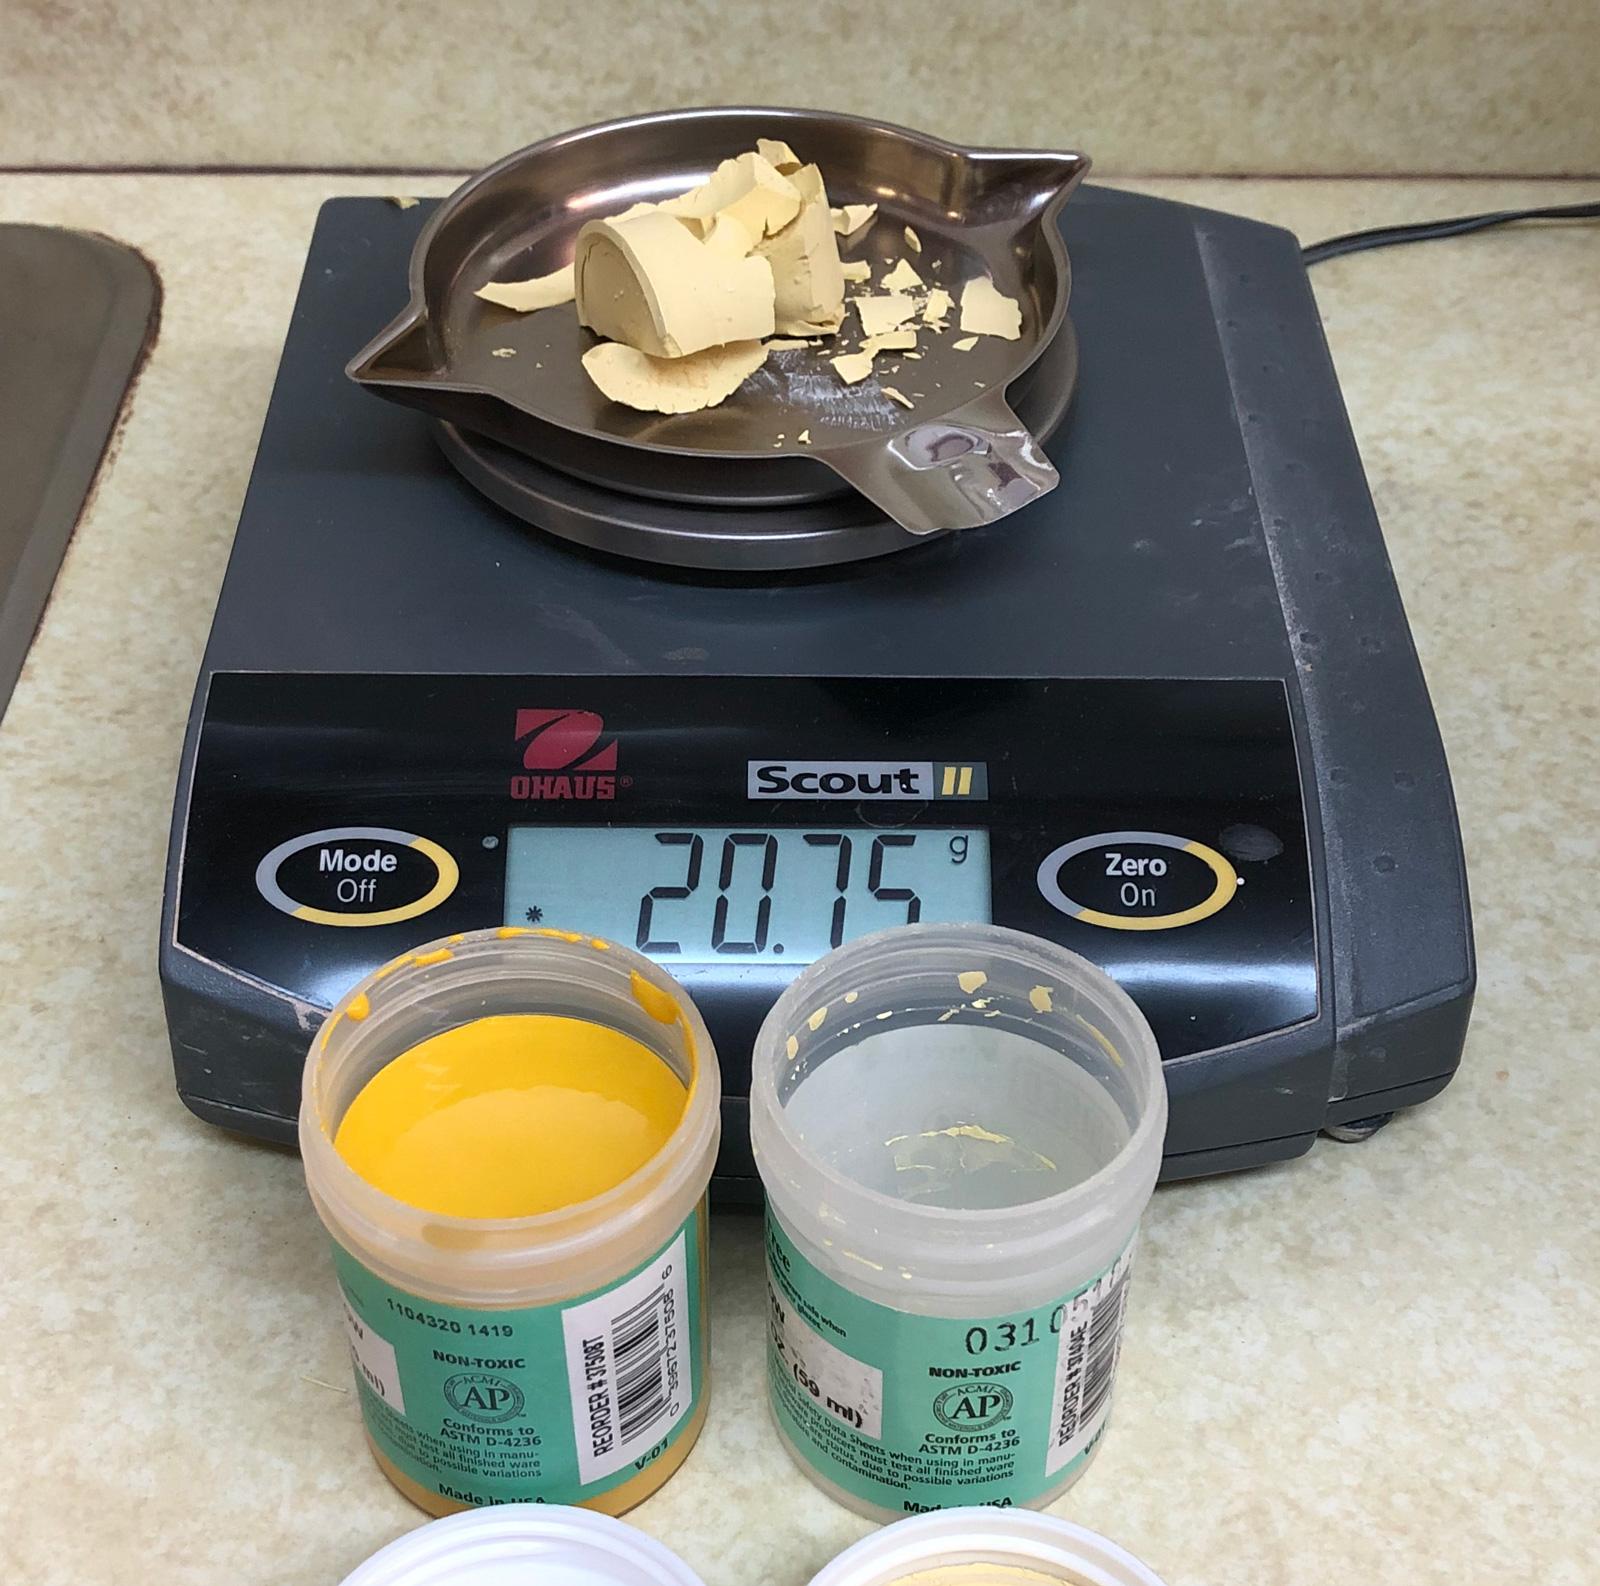 This 2oz jar of underglaze dries down to 21g of powder